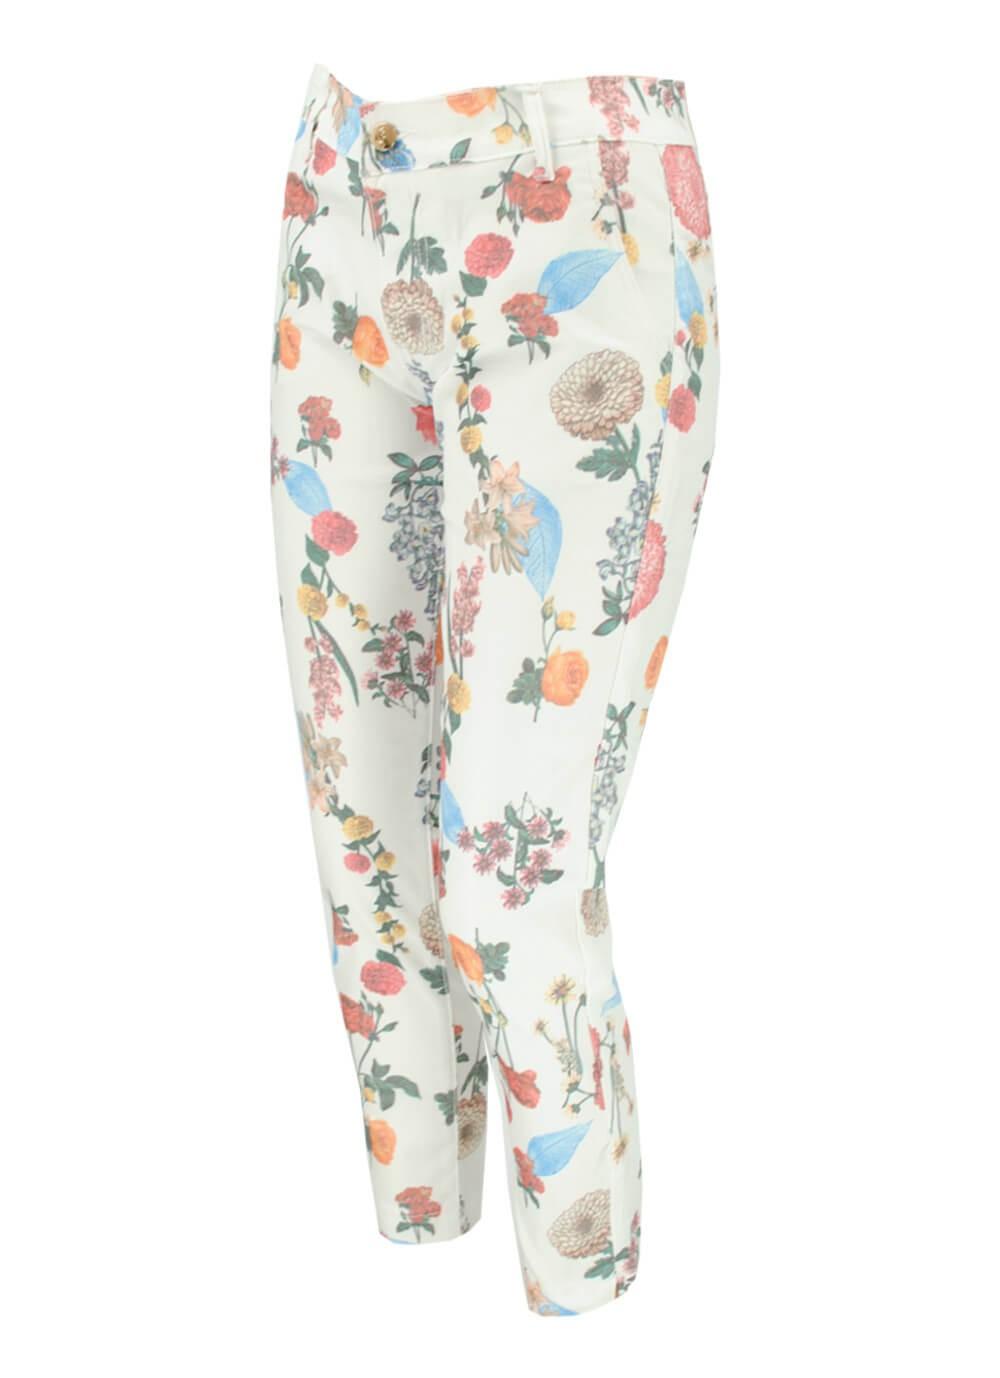 neted design rafinat Pantofi 2018 Pantaloni dama albi cu motiv floral de vara pereche moderna model chic